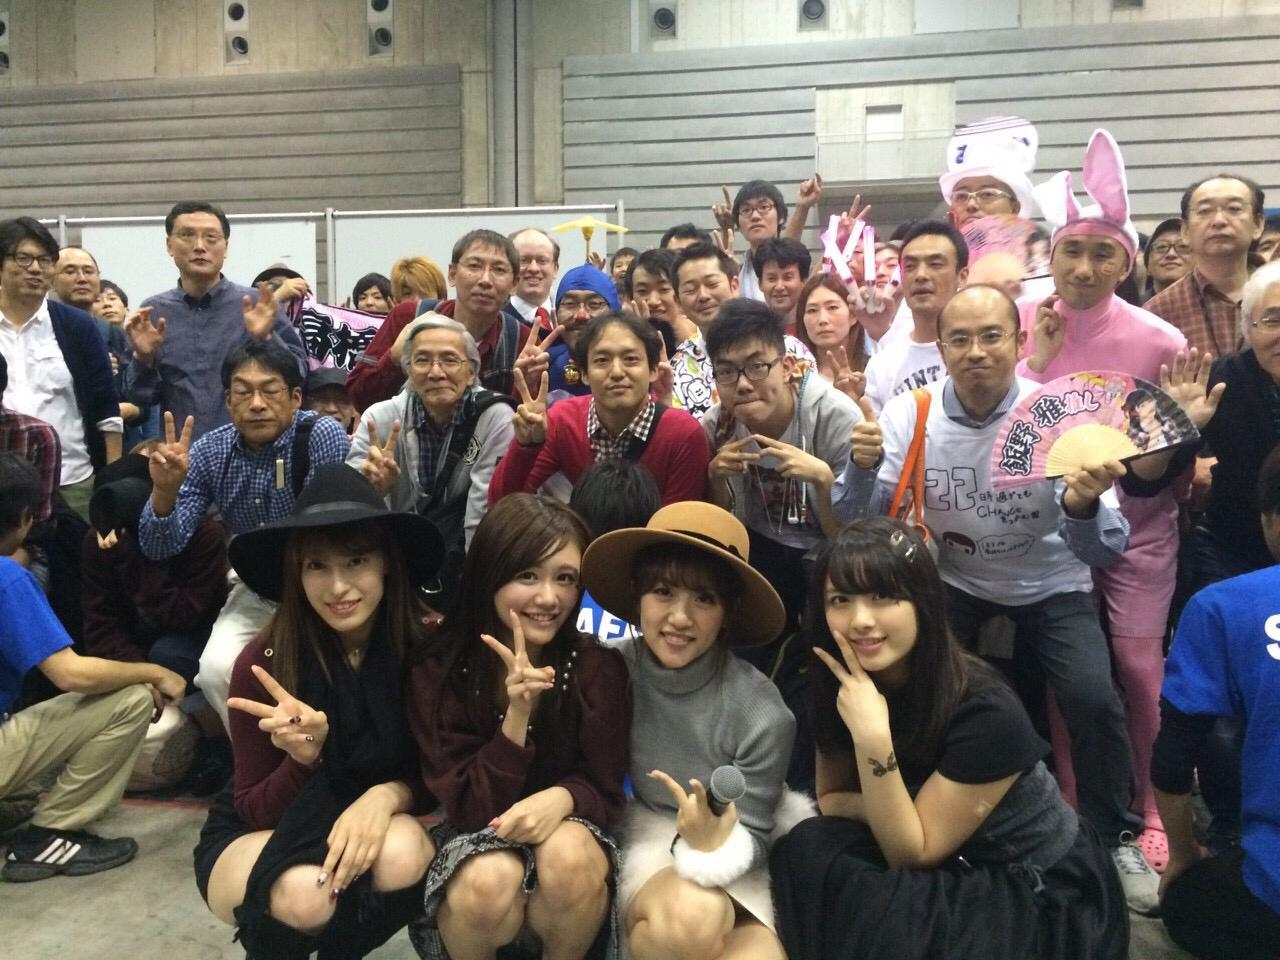 https://i1.wp.com/livedoor.4.blogimg.jp/rabitsokuhou/imgs/8/9/89b3e855.jpg